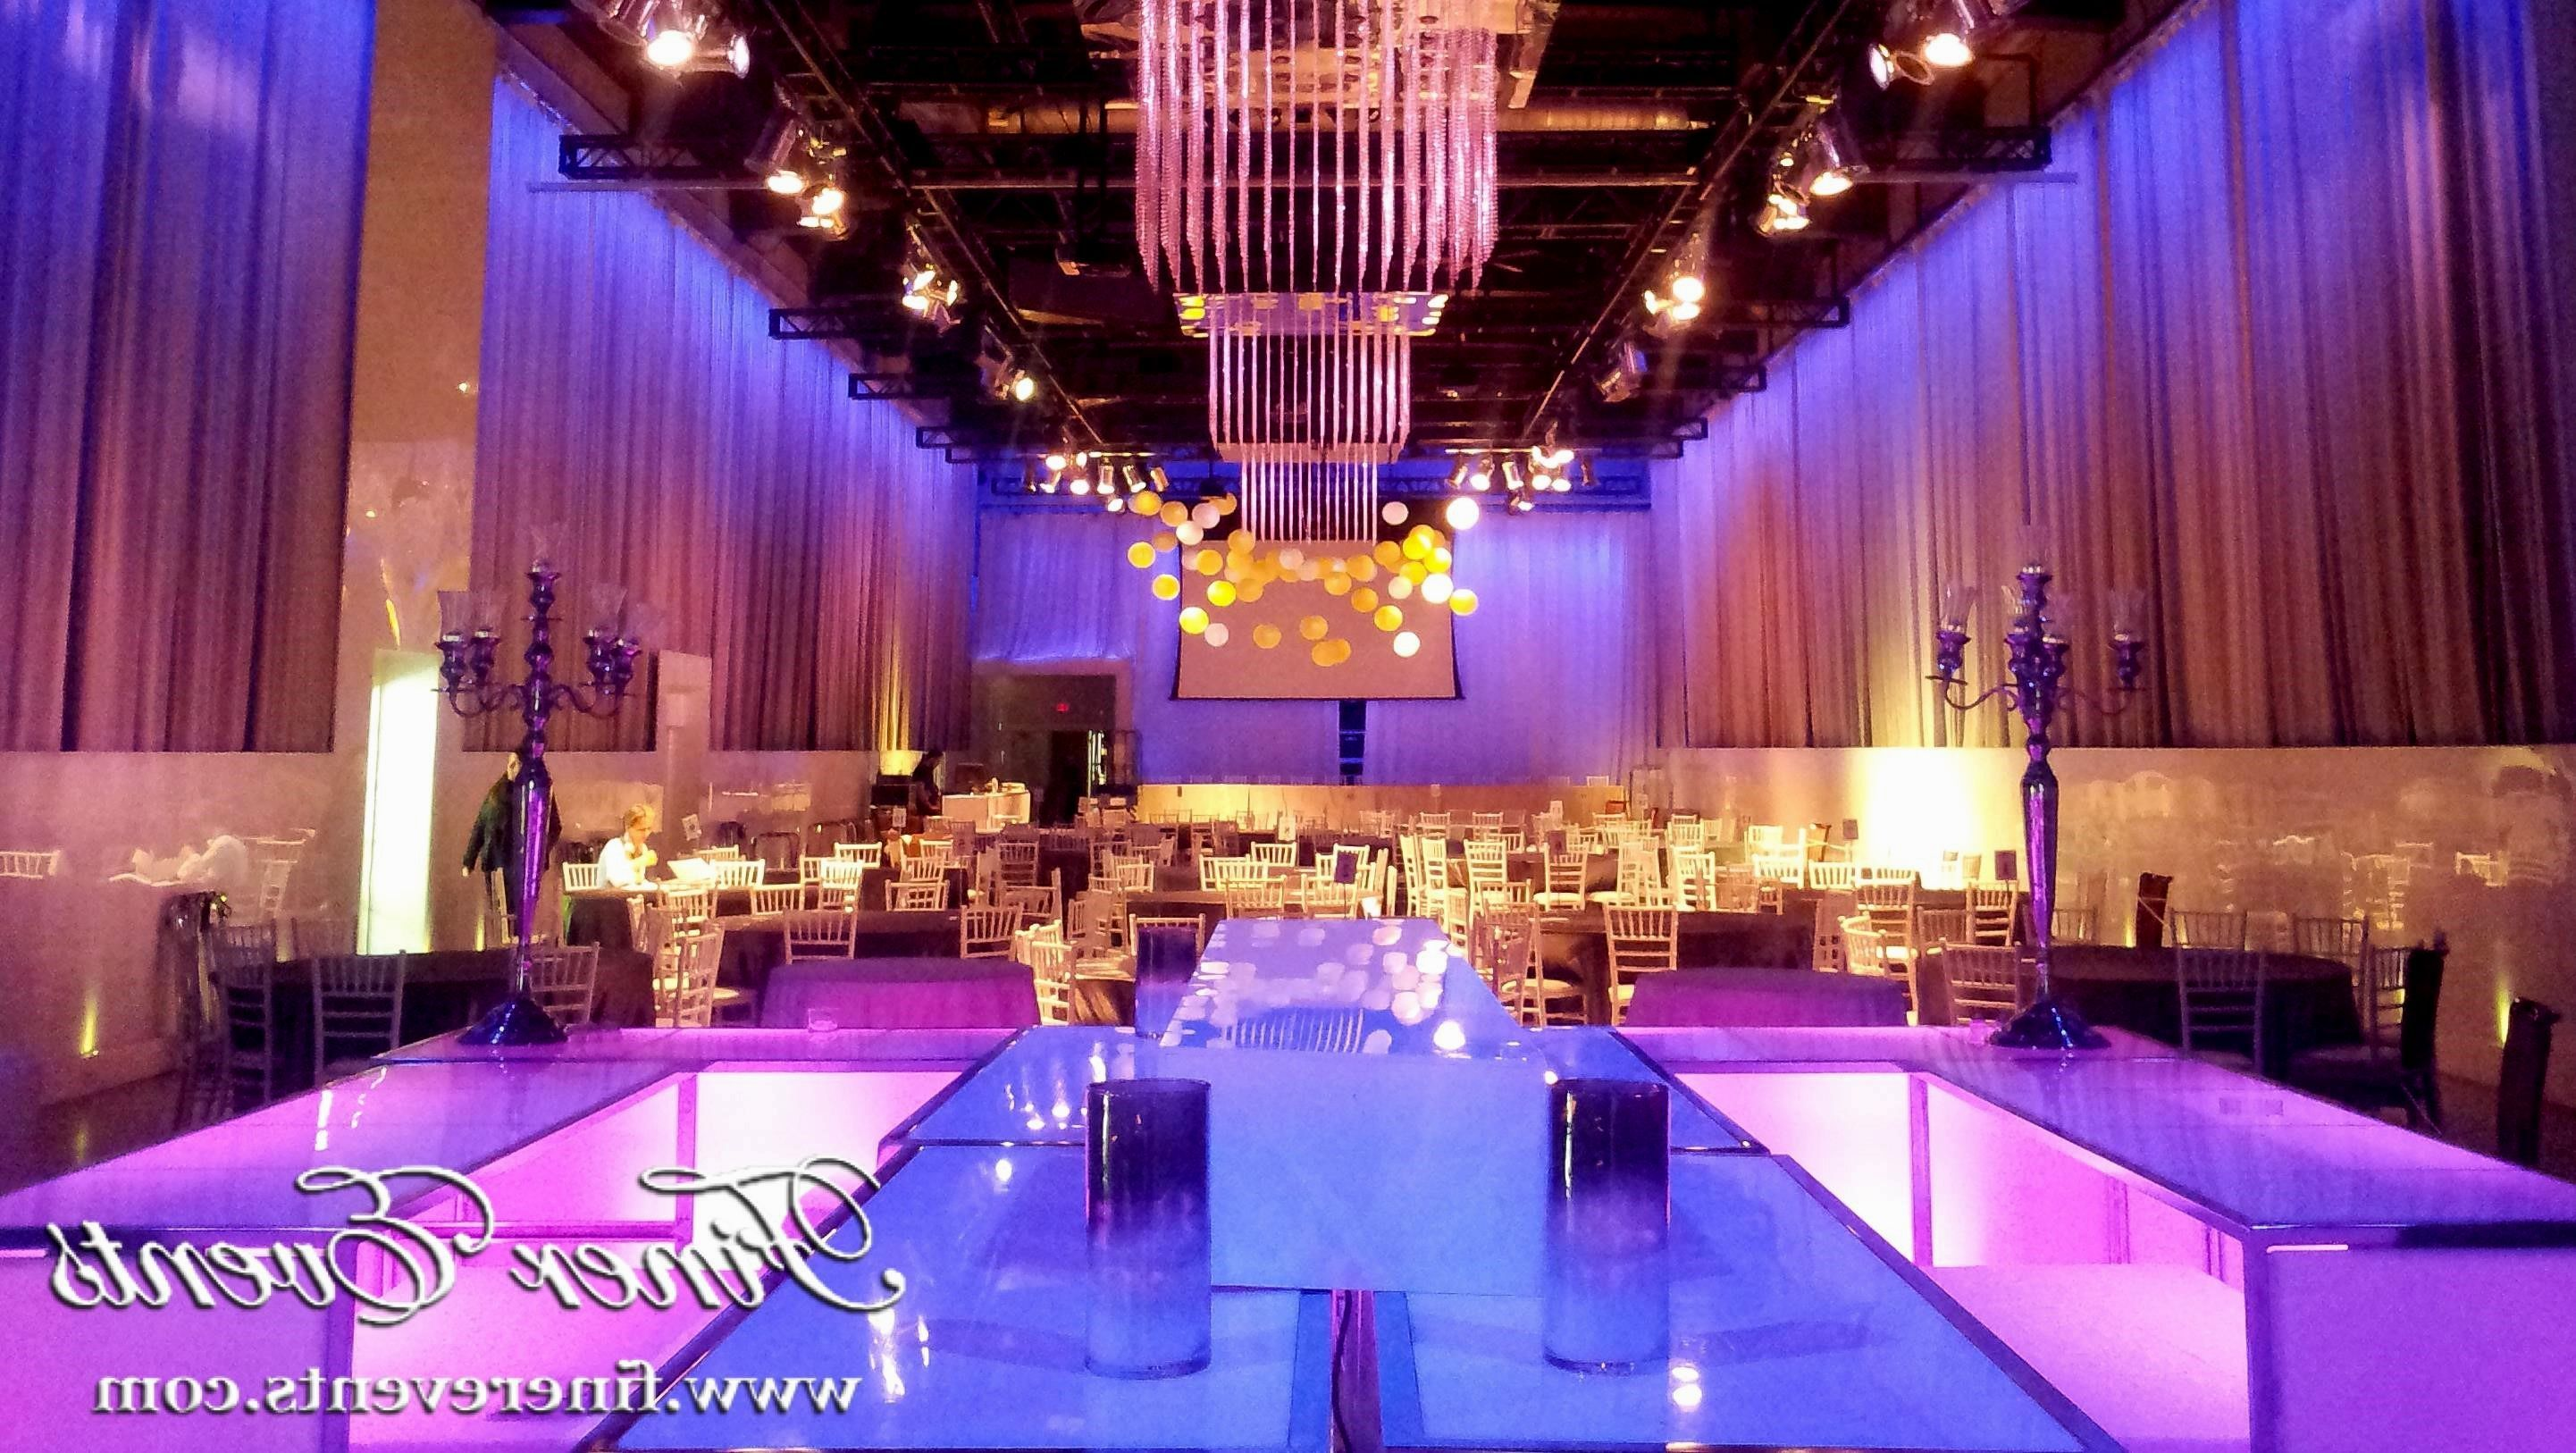 Modern wedding reception decoration ideas wedding decoration modern wedding reception decoration ideas junglespirit Images